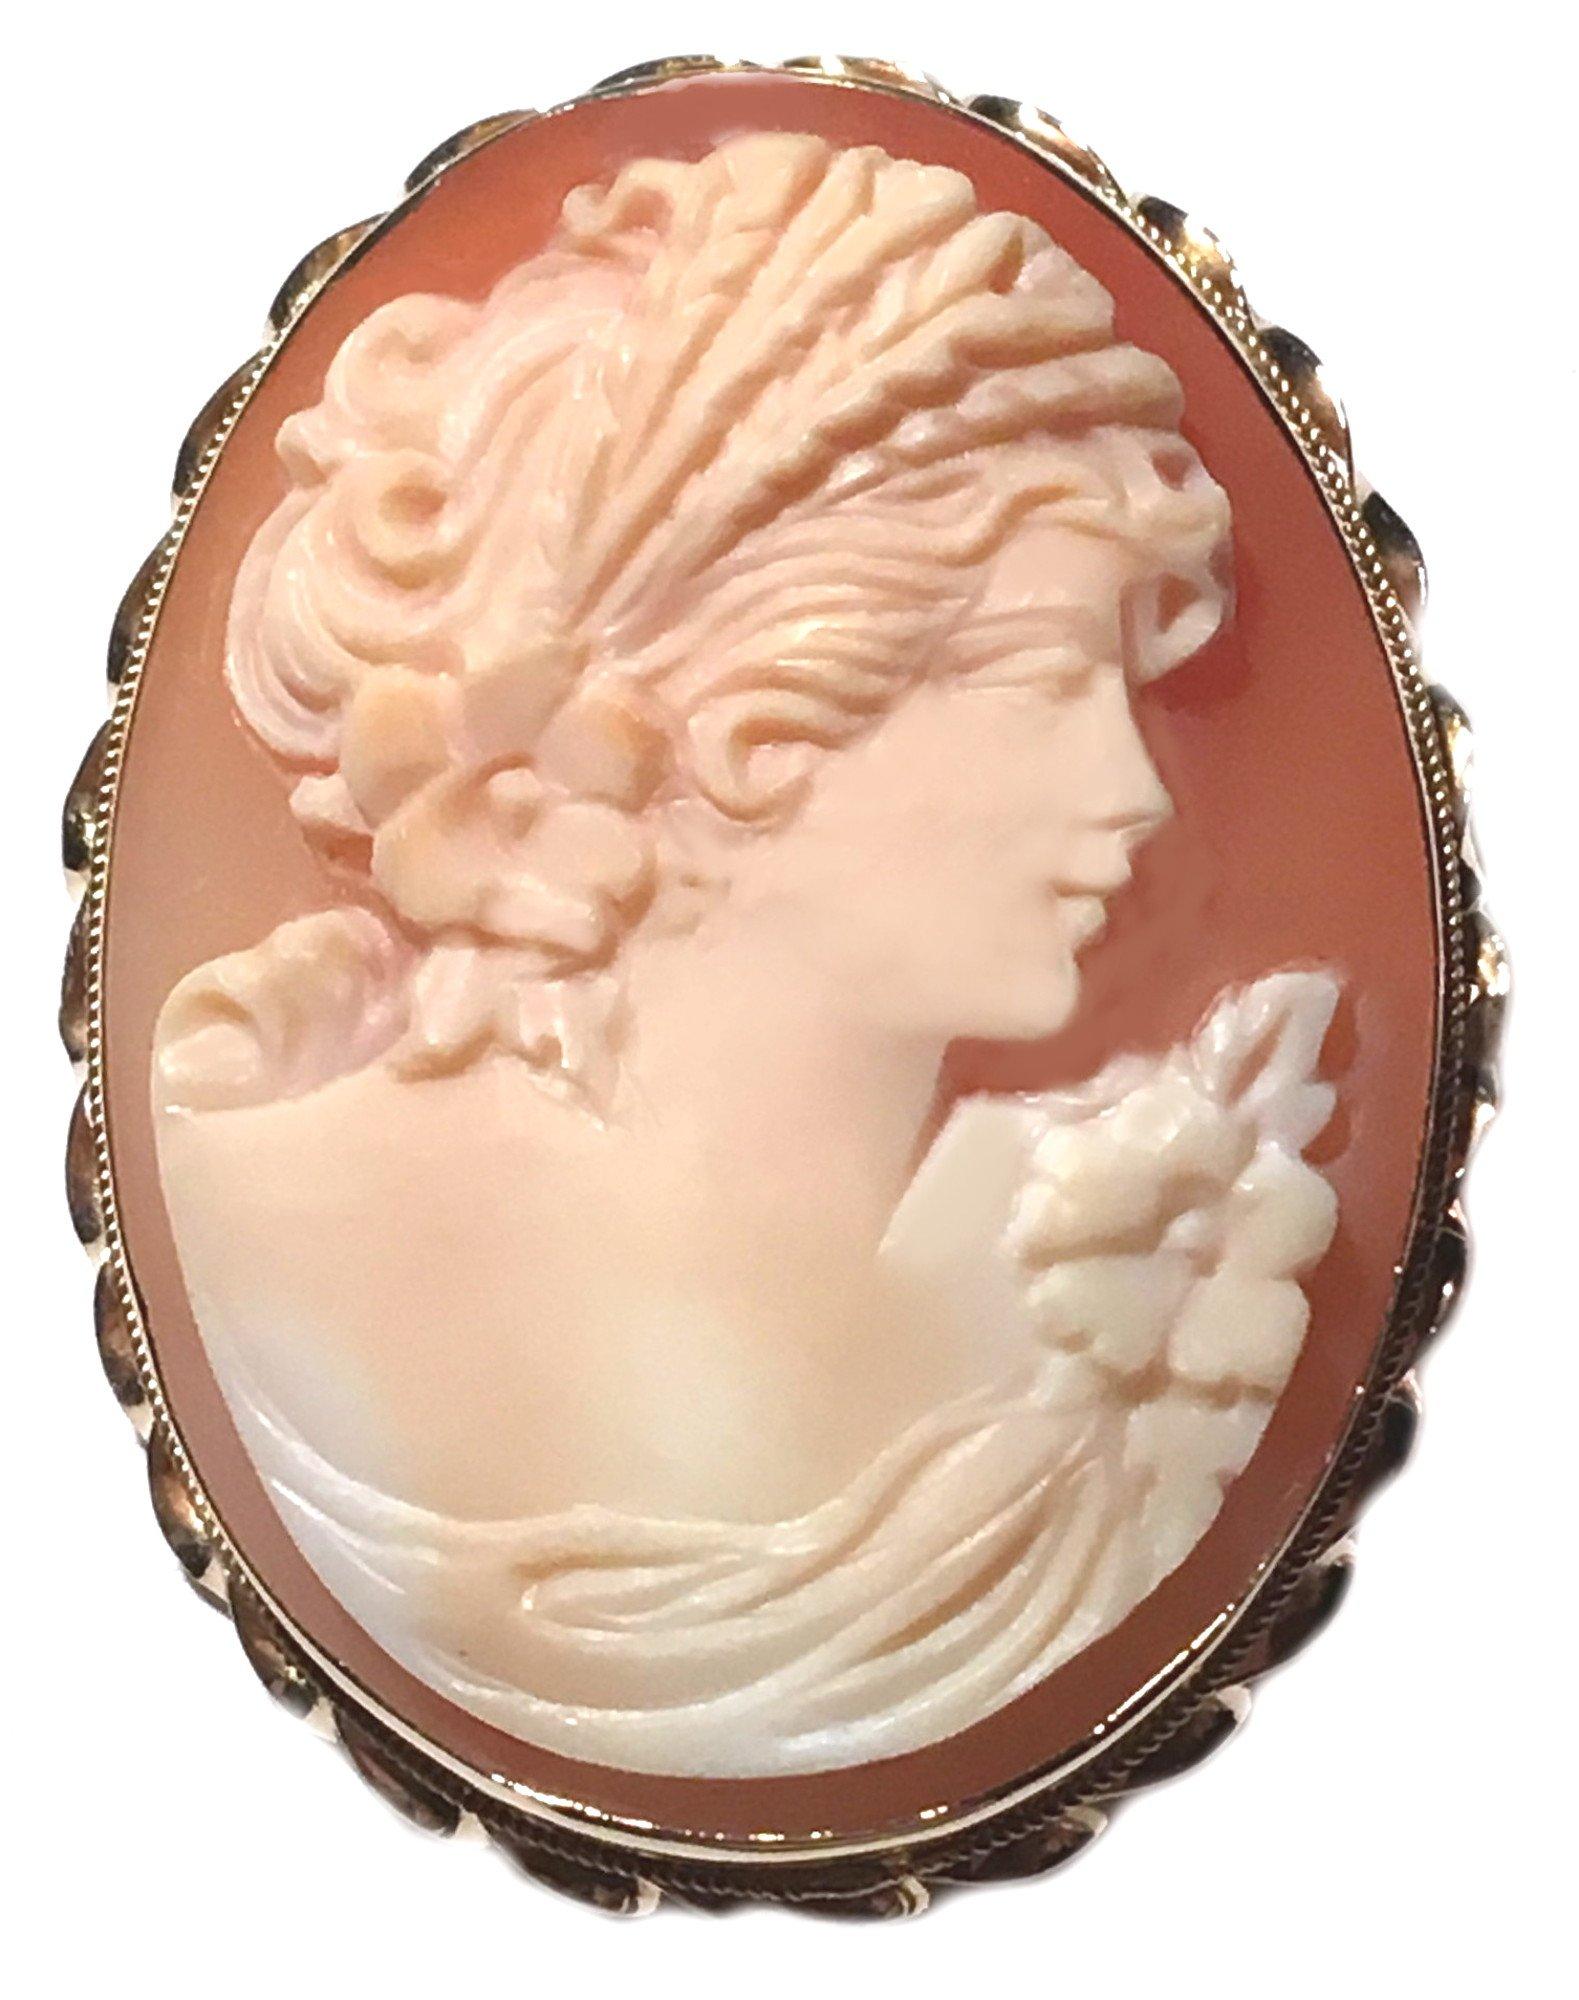 Master Carved, Carnelian Shell Autumn Love Cameo Brooch and Pendant Italian 14k Yellow Gold Italian